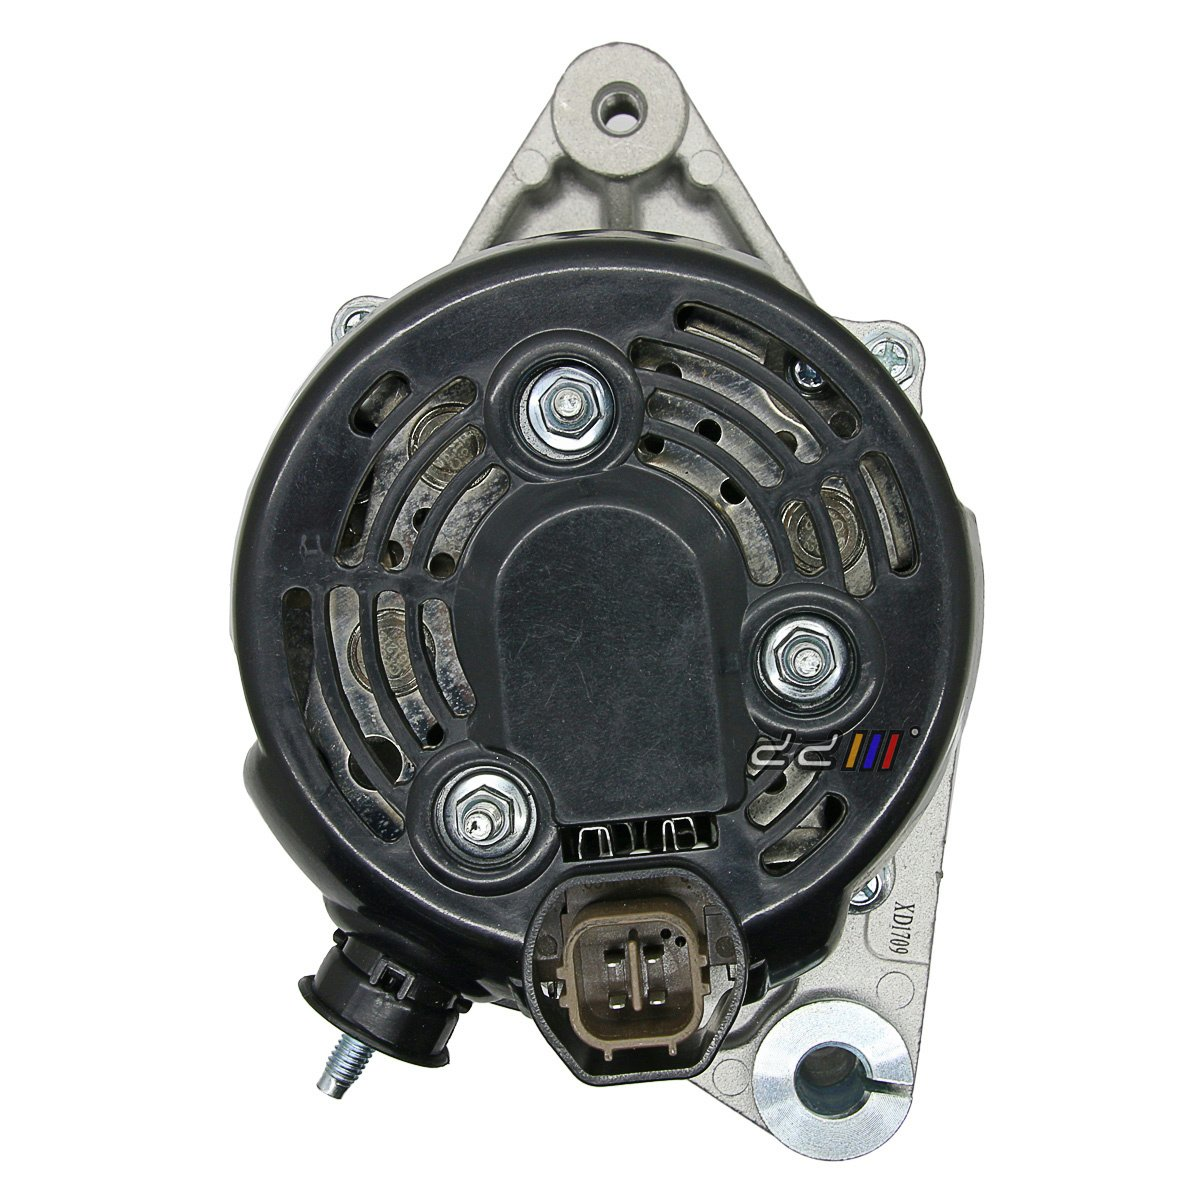 Amazon.com: 100A Alternator For Toyota Hilux VIGO D4D KUN16 KUN26 1KD-FTV 2KD-FTV 2005-14: Automotive